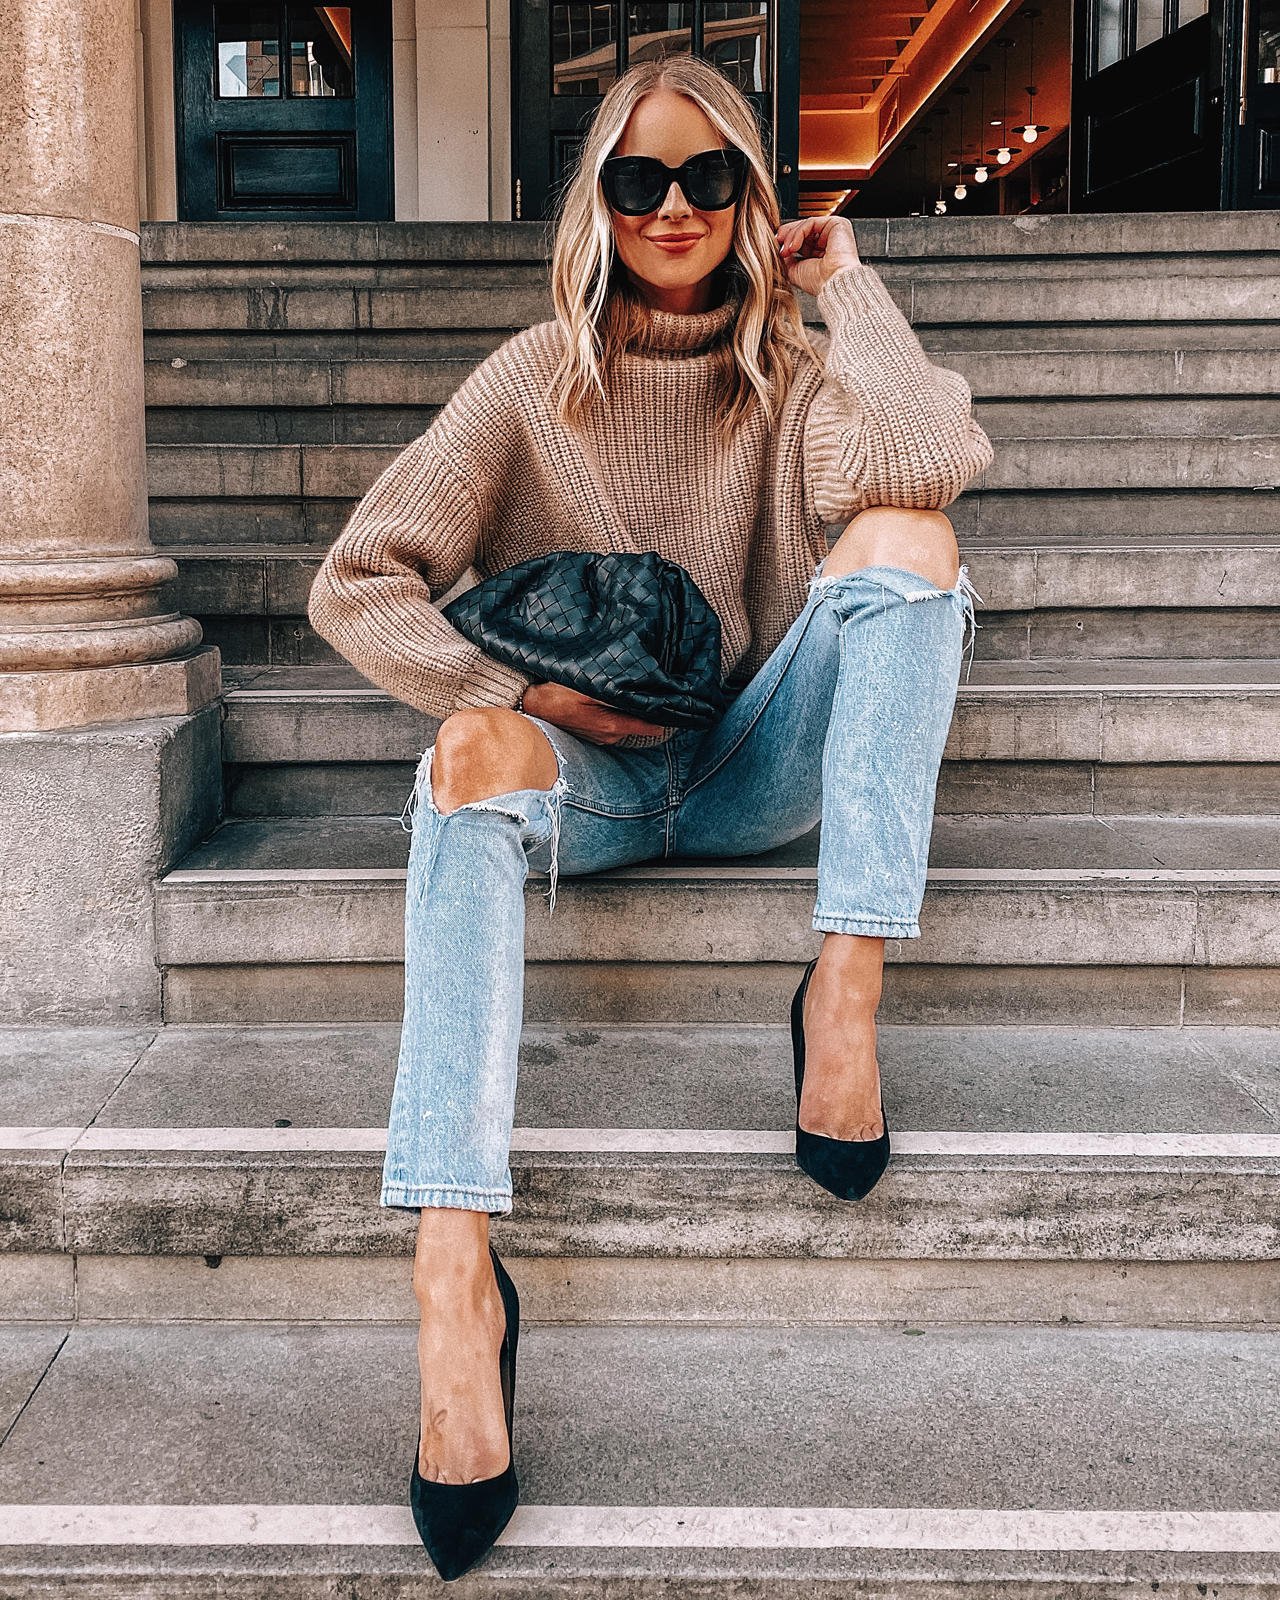 Fashion Jackson Wearing Anine Bing Tan Turtleneck Sweater Ripped Jeans Black Pumps